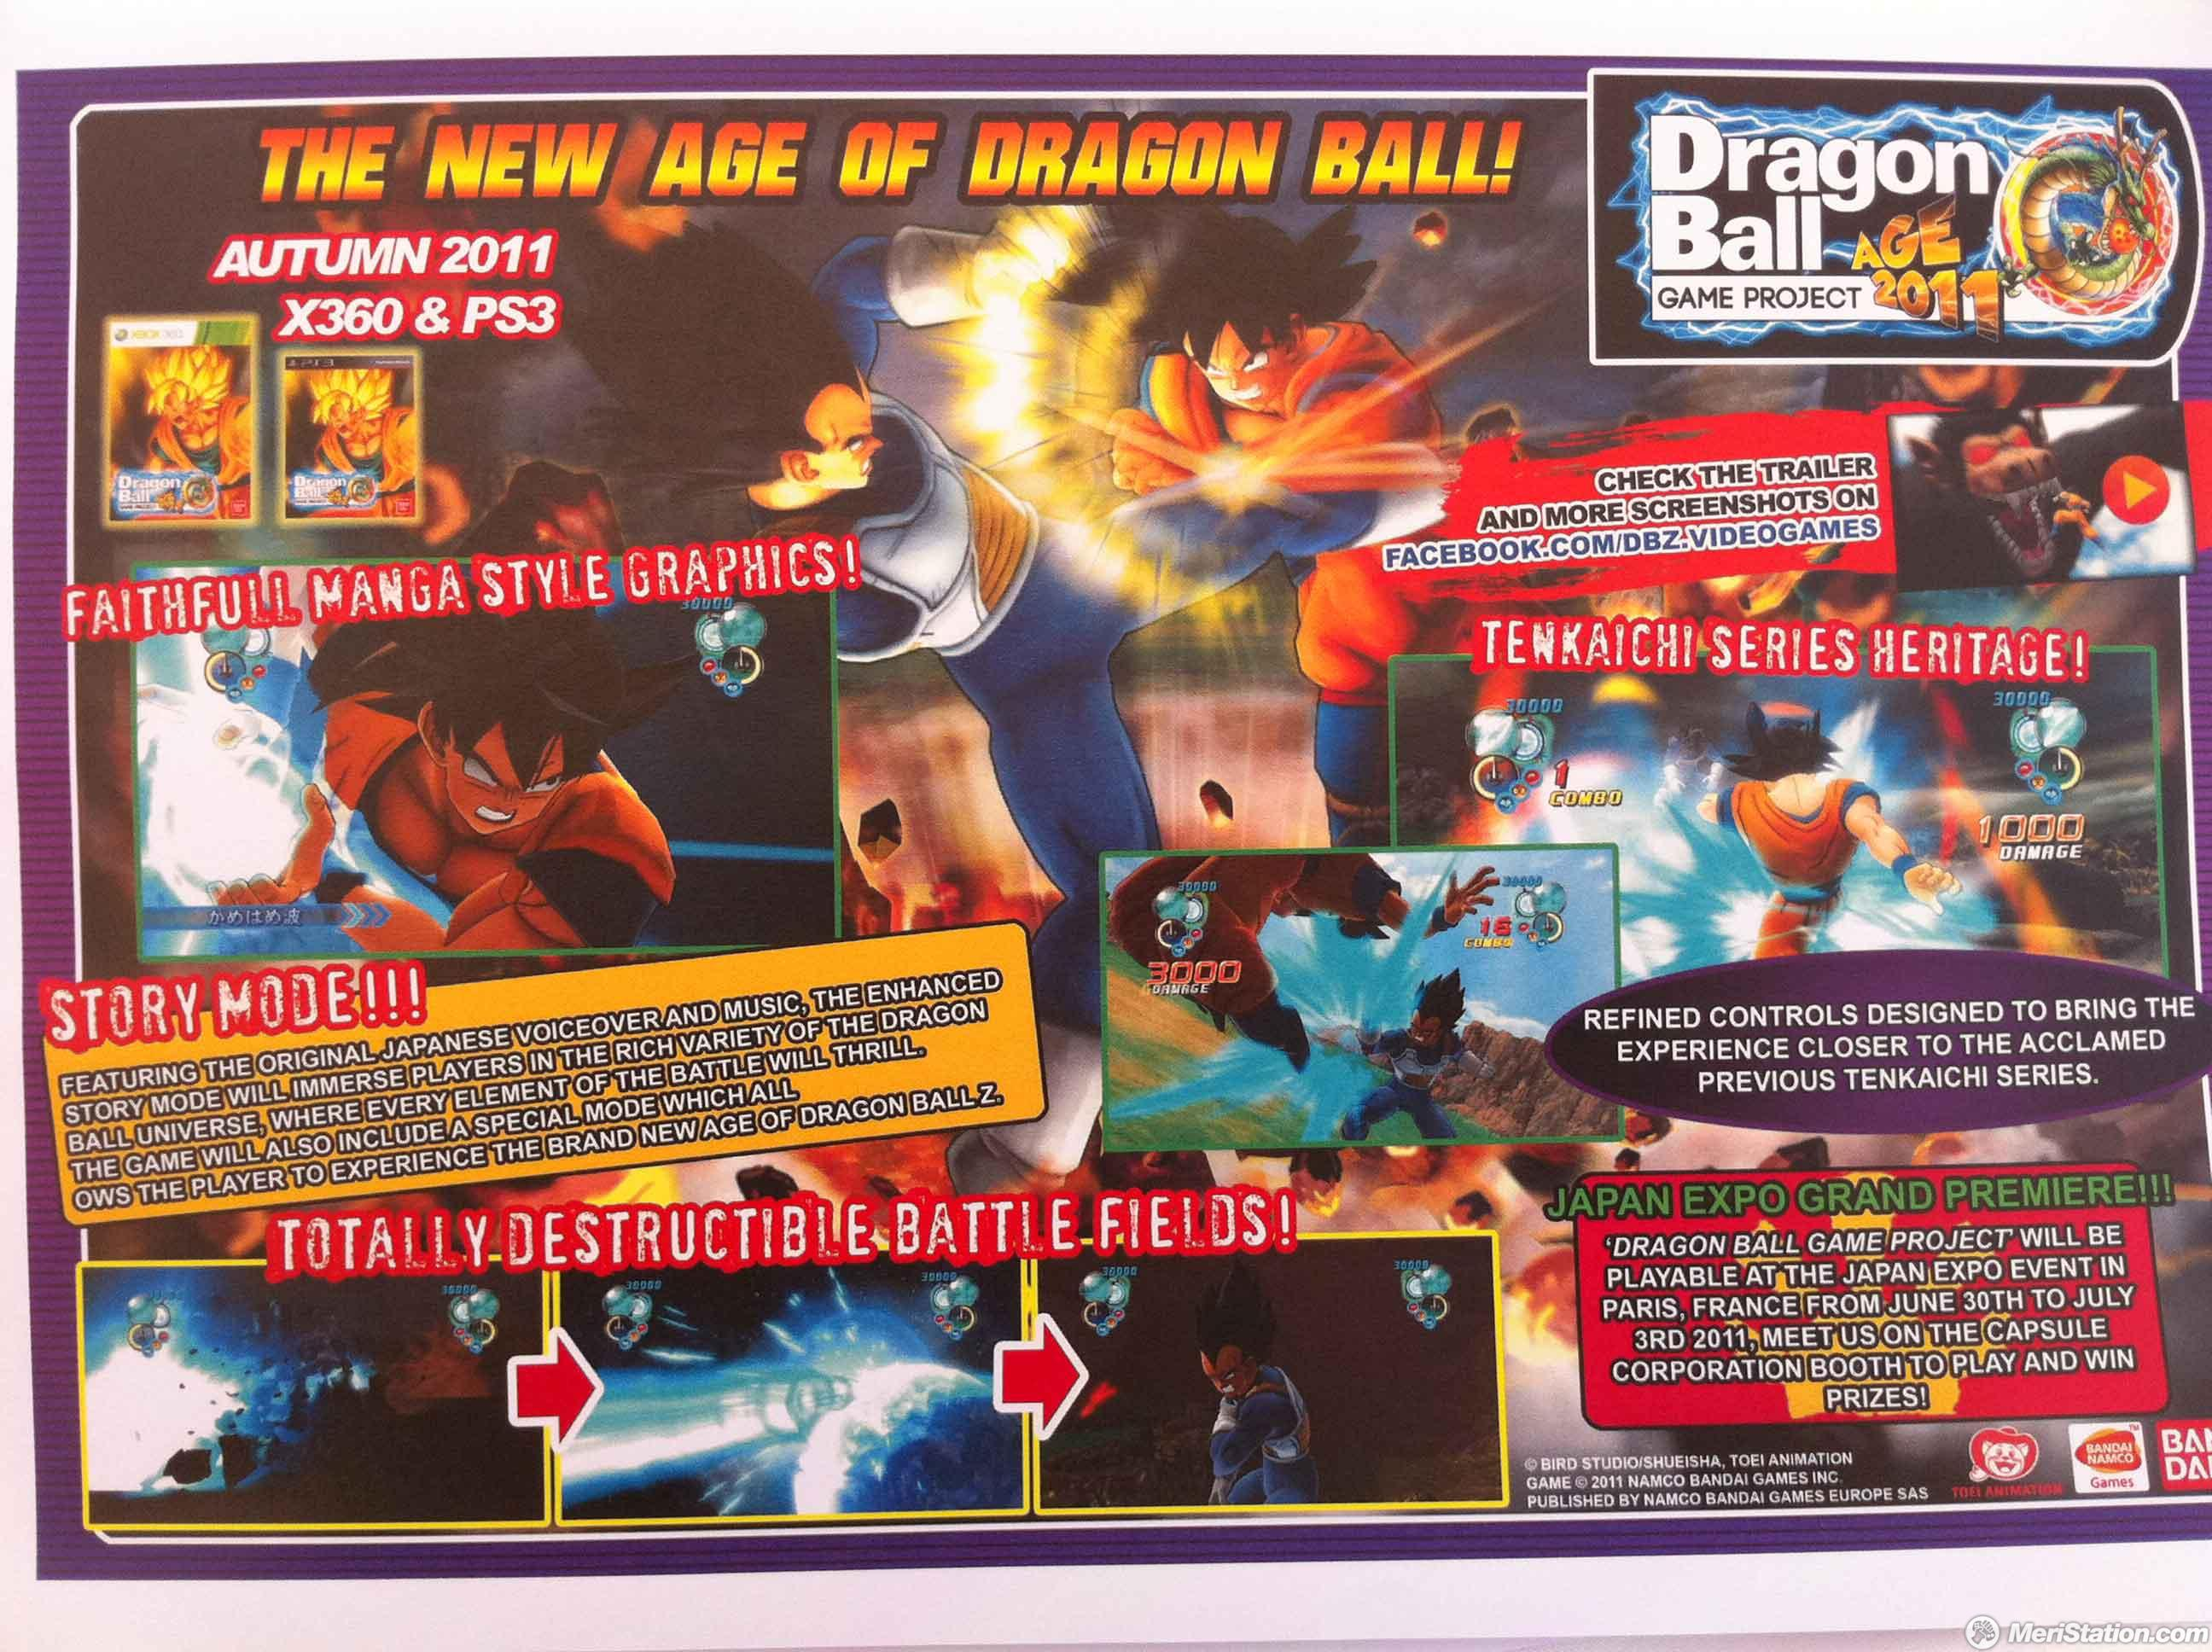 insanecyclone games king amazing cartoonsanime doubttttttttttt ball ultimate tenkaichi quality dragon